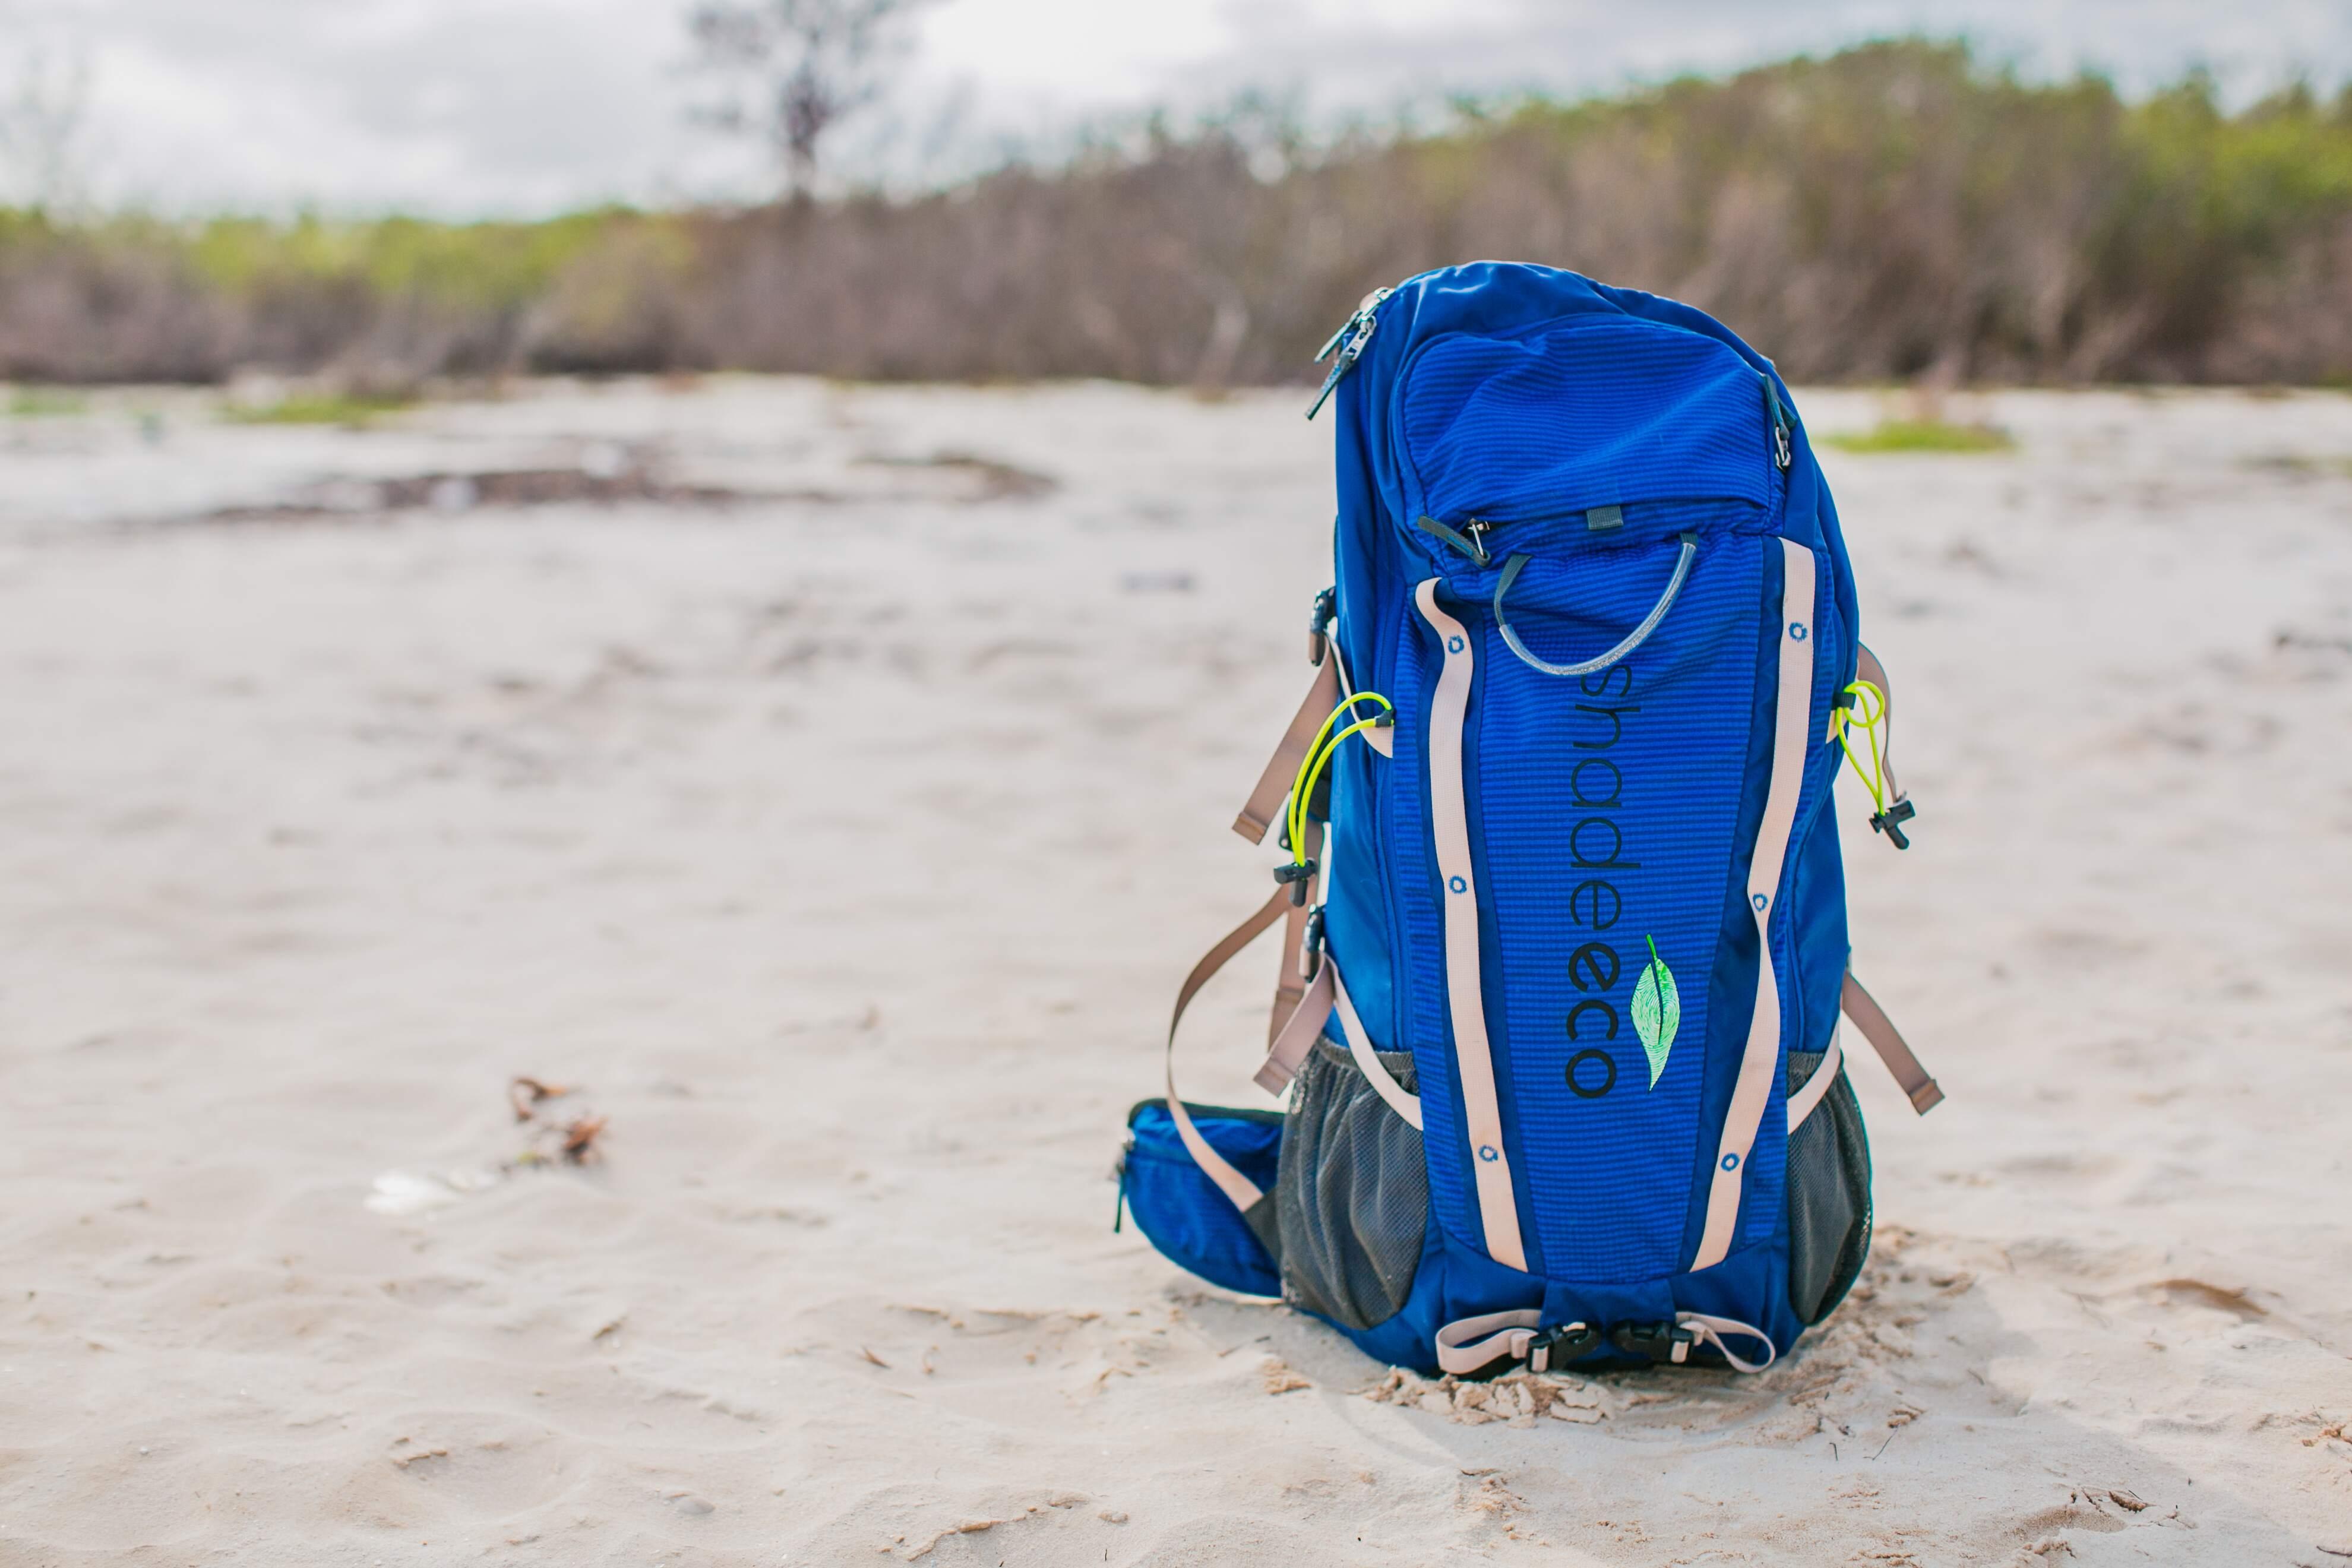 Shadeeco Backpack